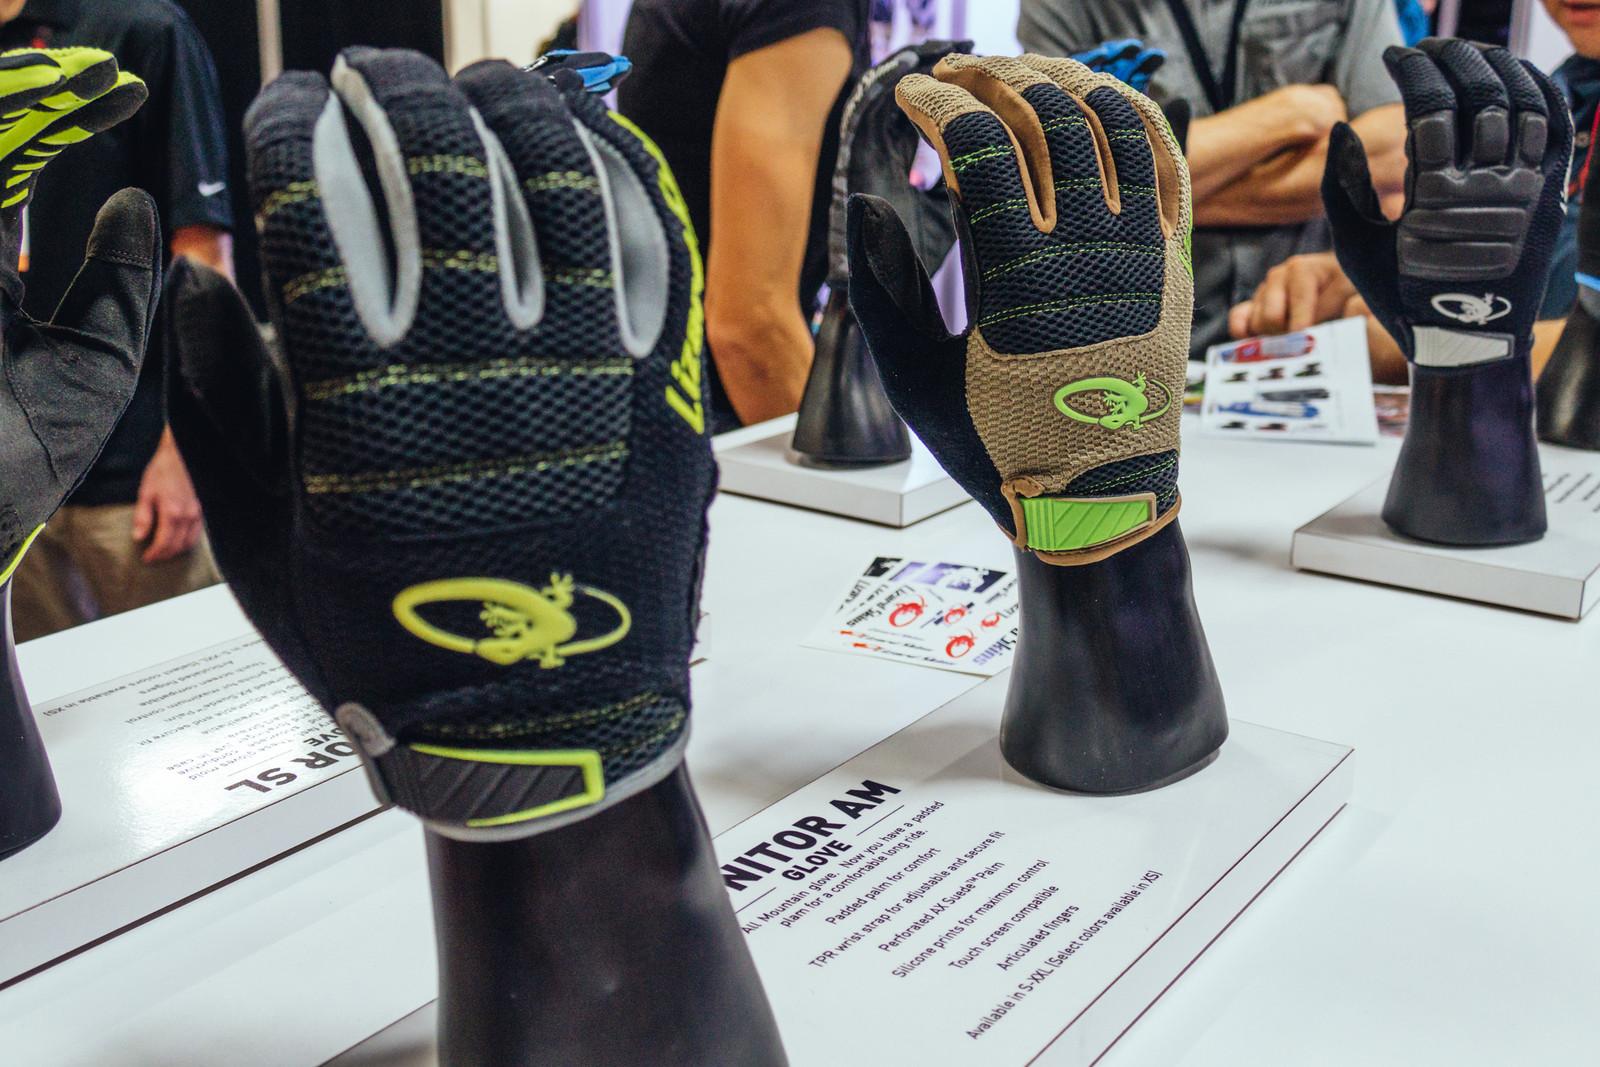 Lizard Skins Monitor Gloves - INTERBIKE - 2017 Mountain Bike Apparel and Protective Gear - Mountain Biking Pictures - Vital MTB